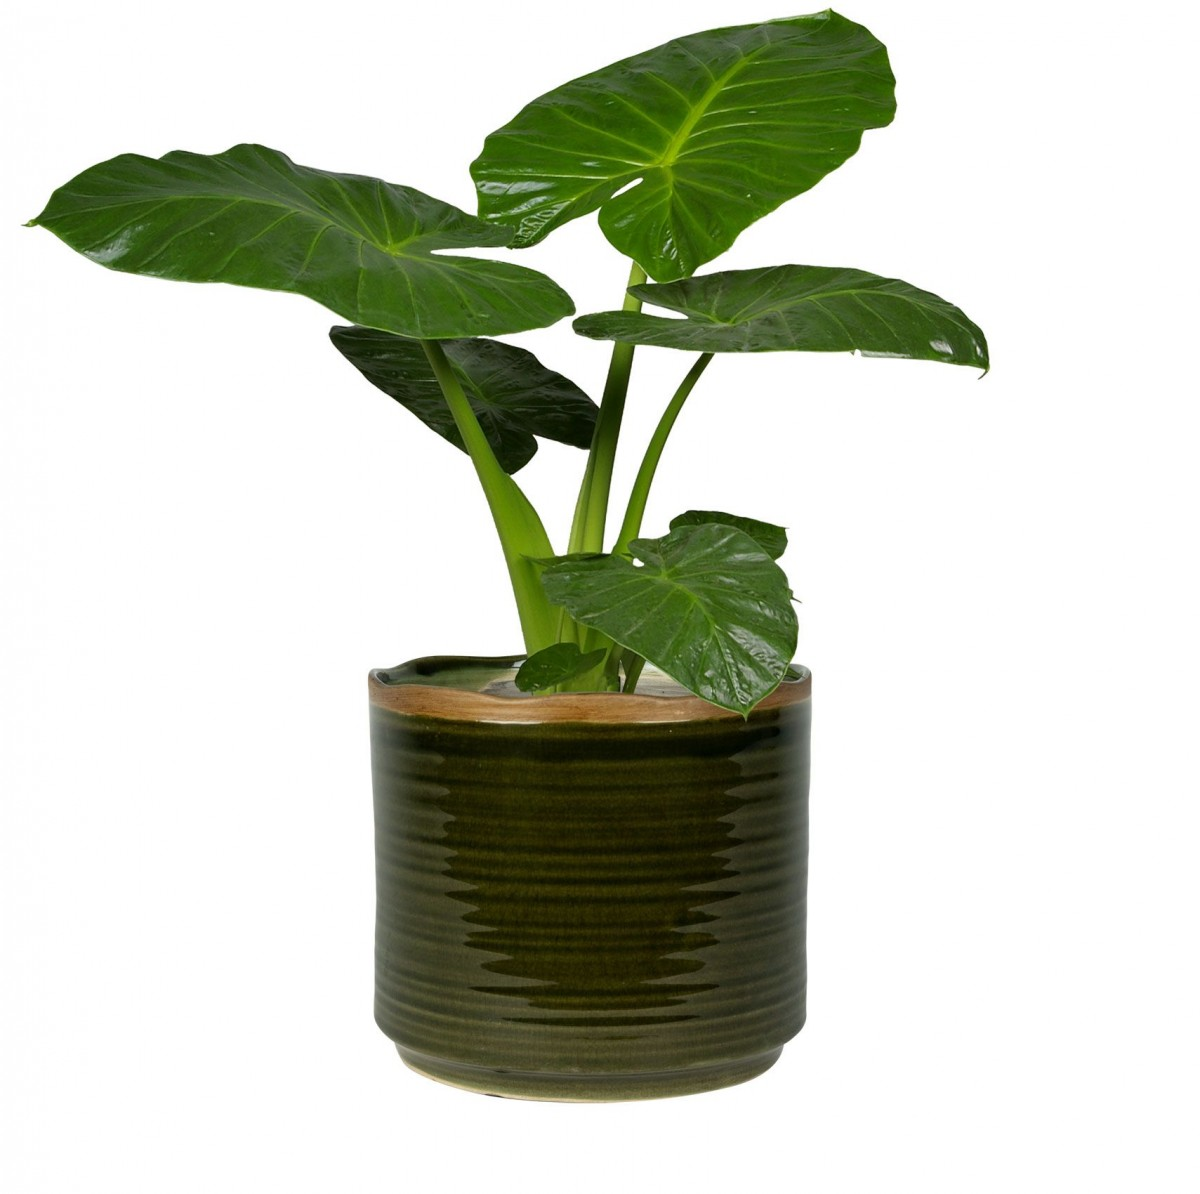 Plantenkamer-Jordy-forest-groen